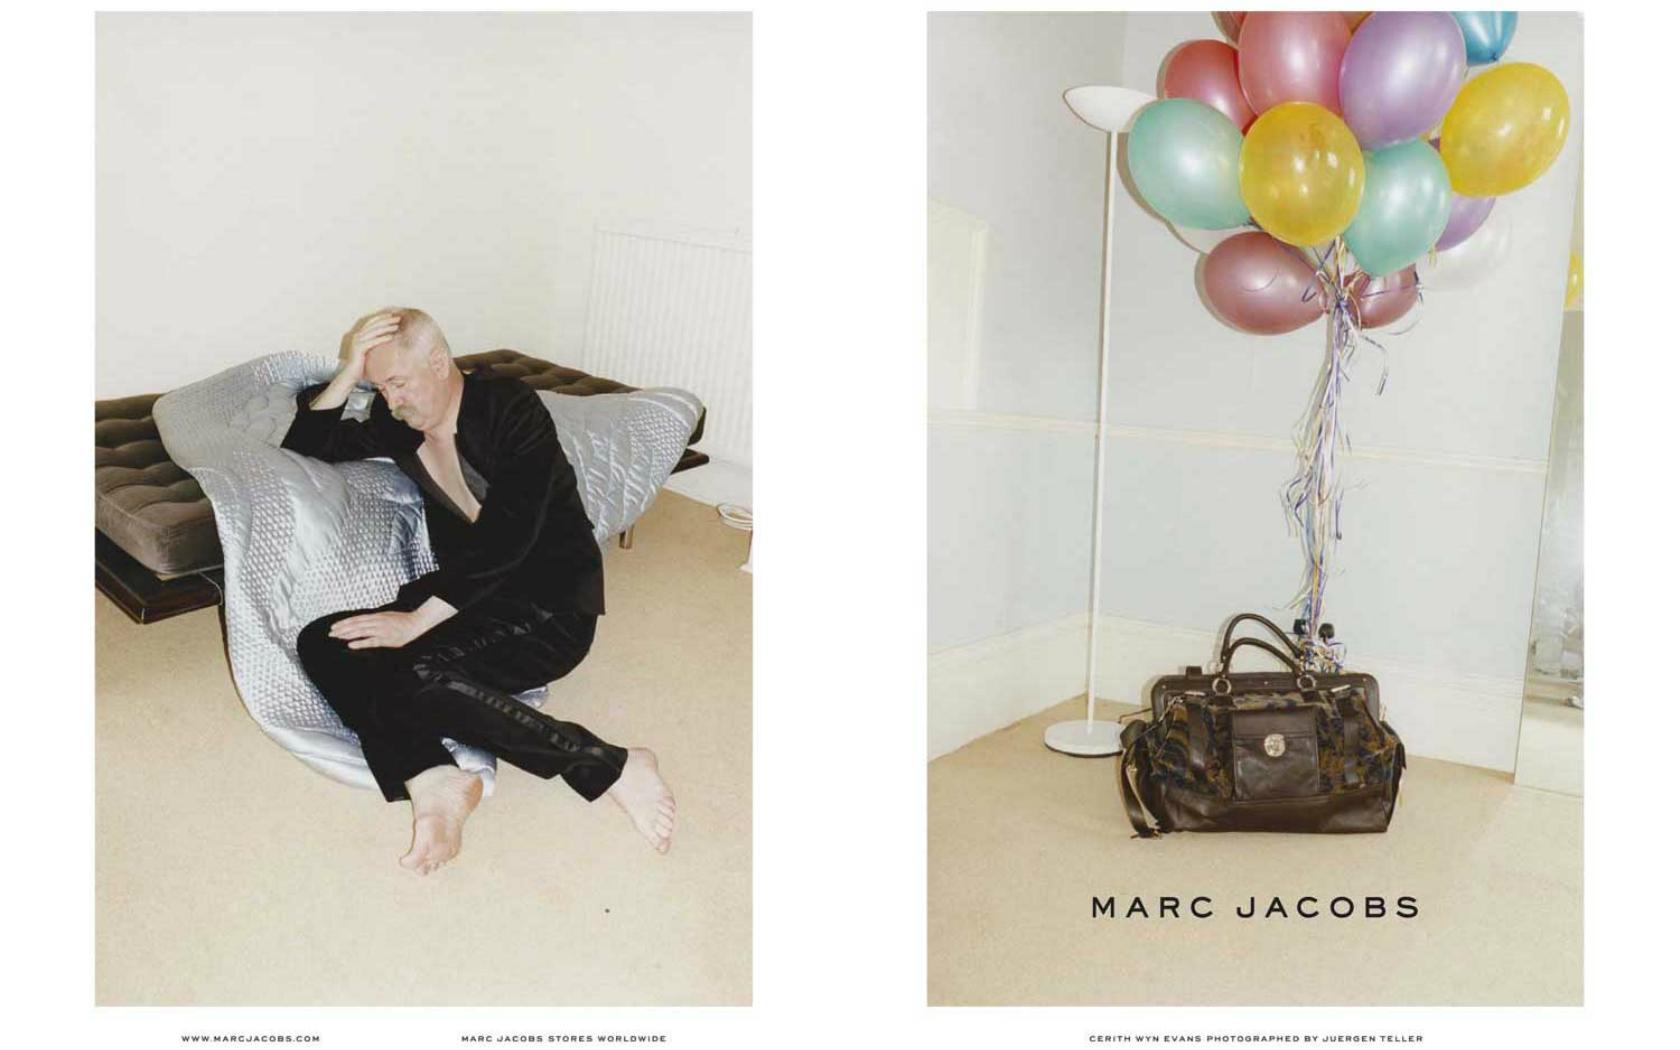 Marc Jacobs & Juergen Teller